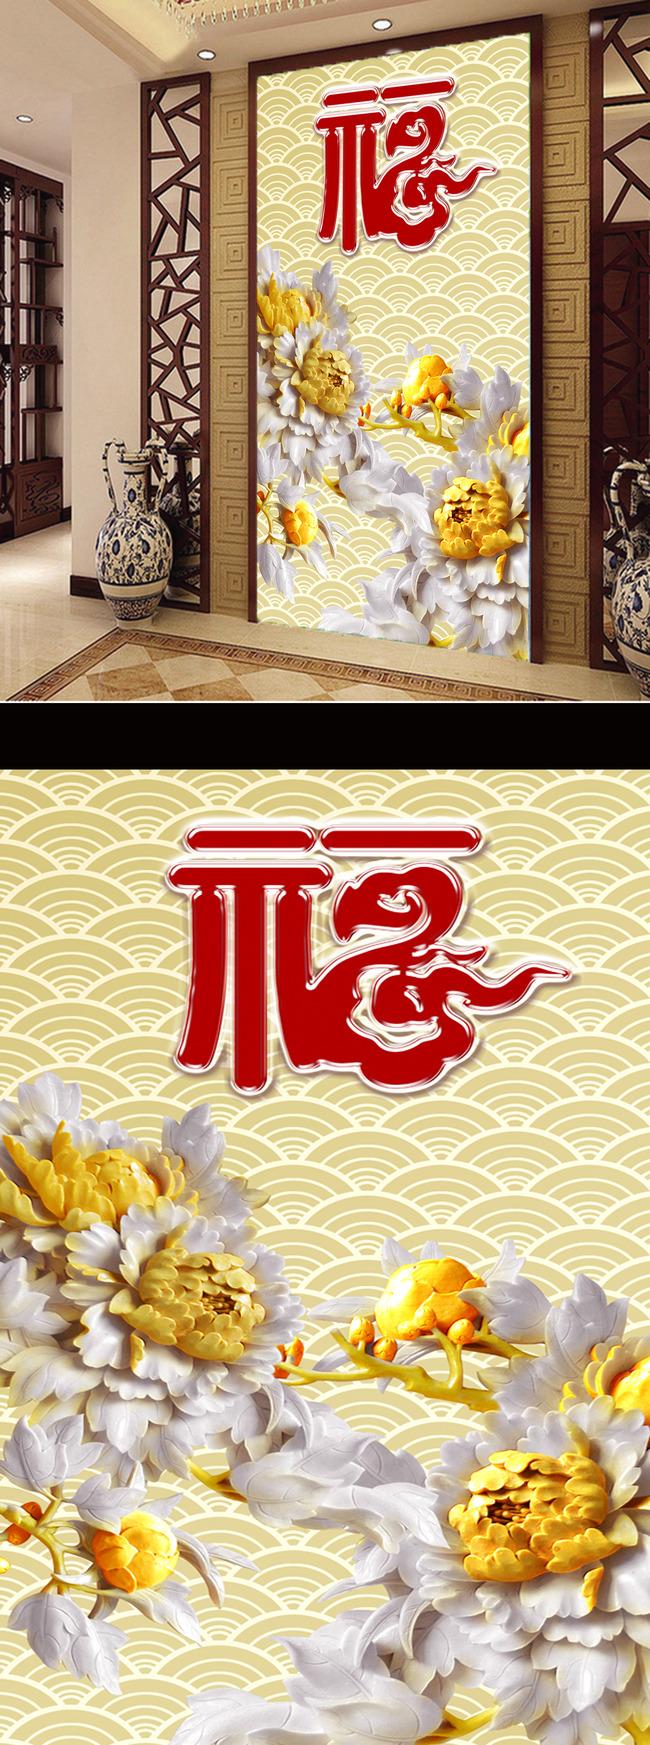 3d立体木雕牡丹福字玄关画